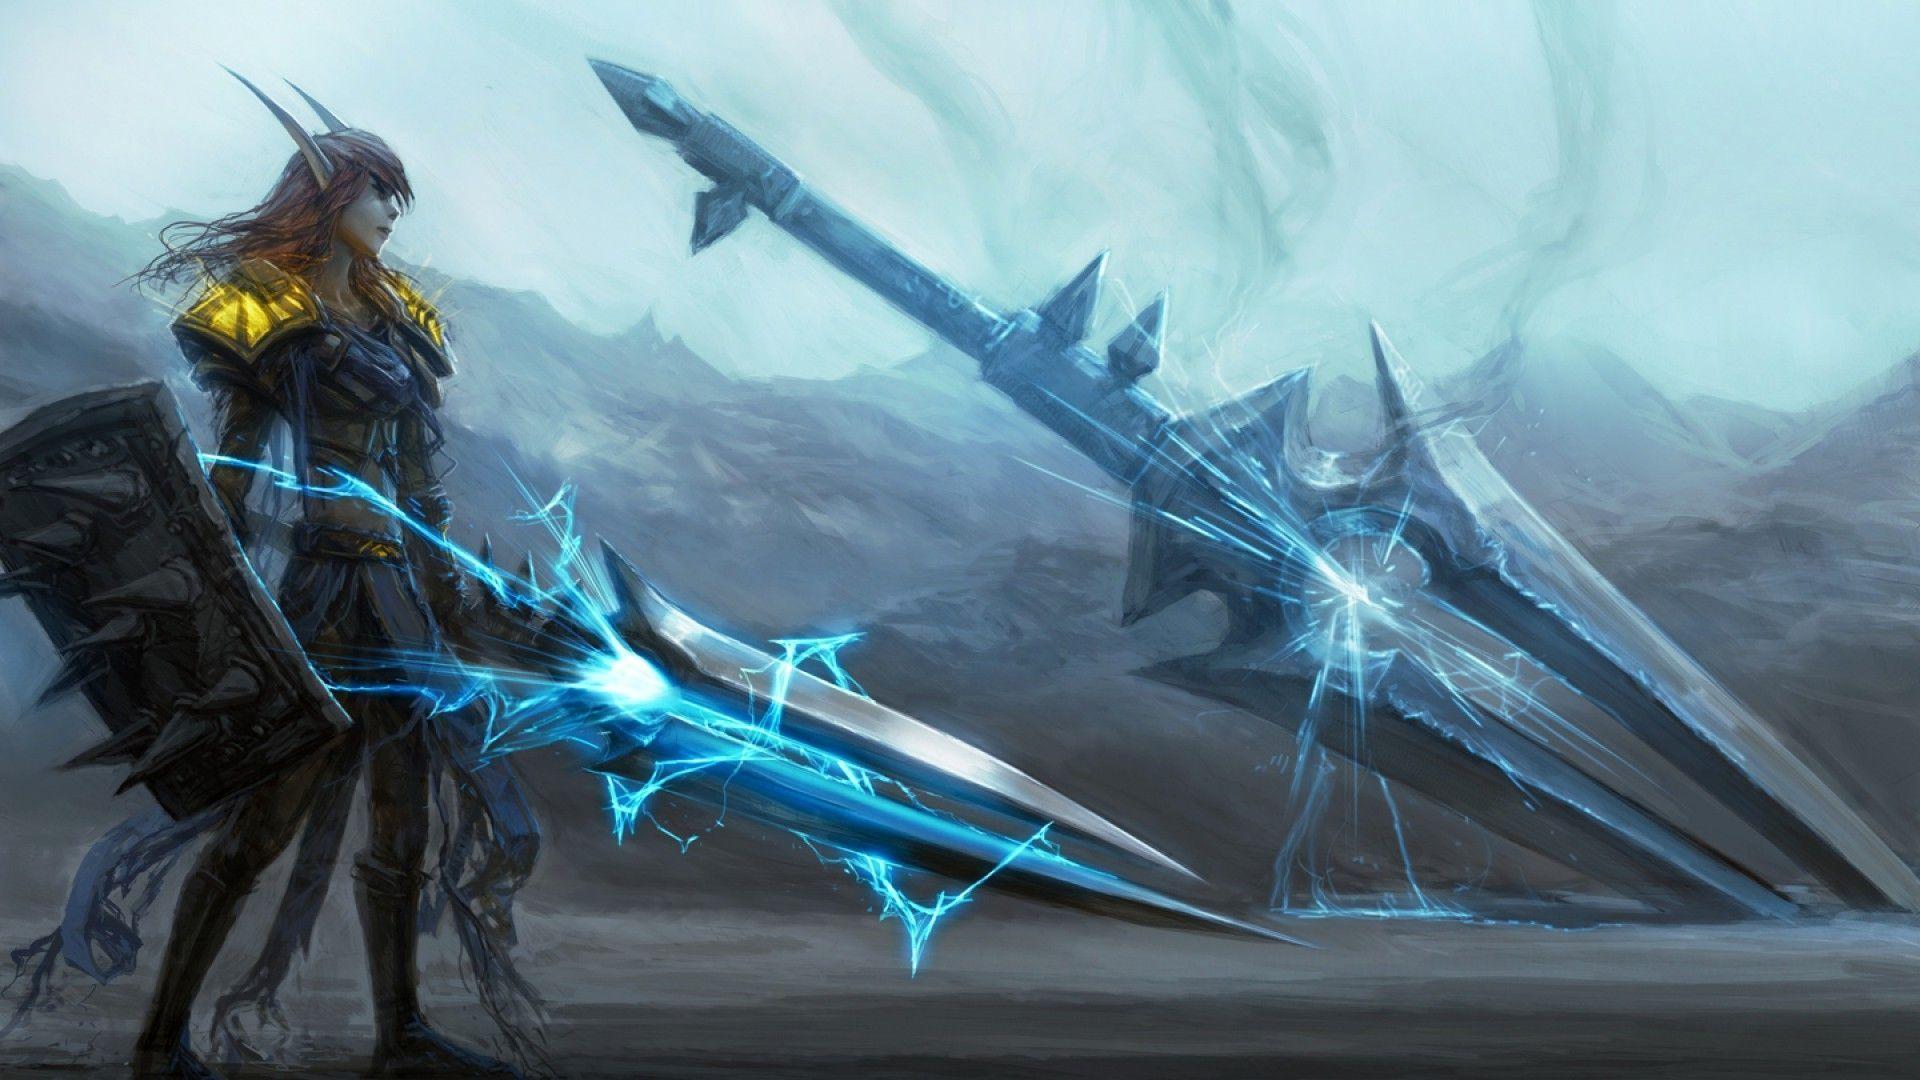 Paladin World Of Warcraft Wallpaper World Of Warcraft Wallpaper World Of Warcraft Game World Of Warcraft Legion